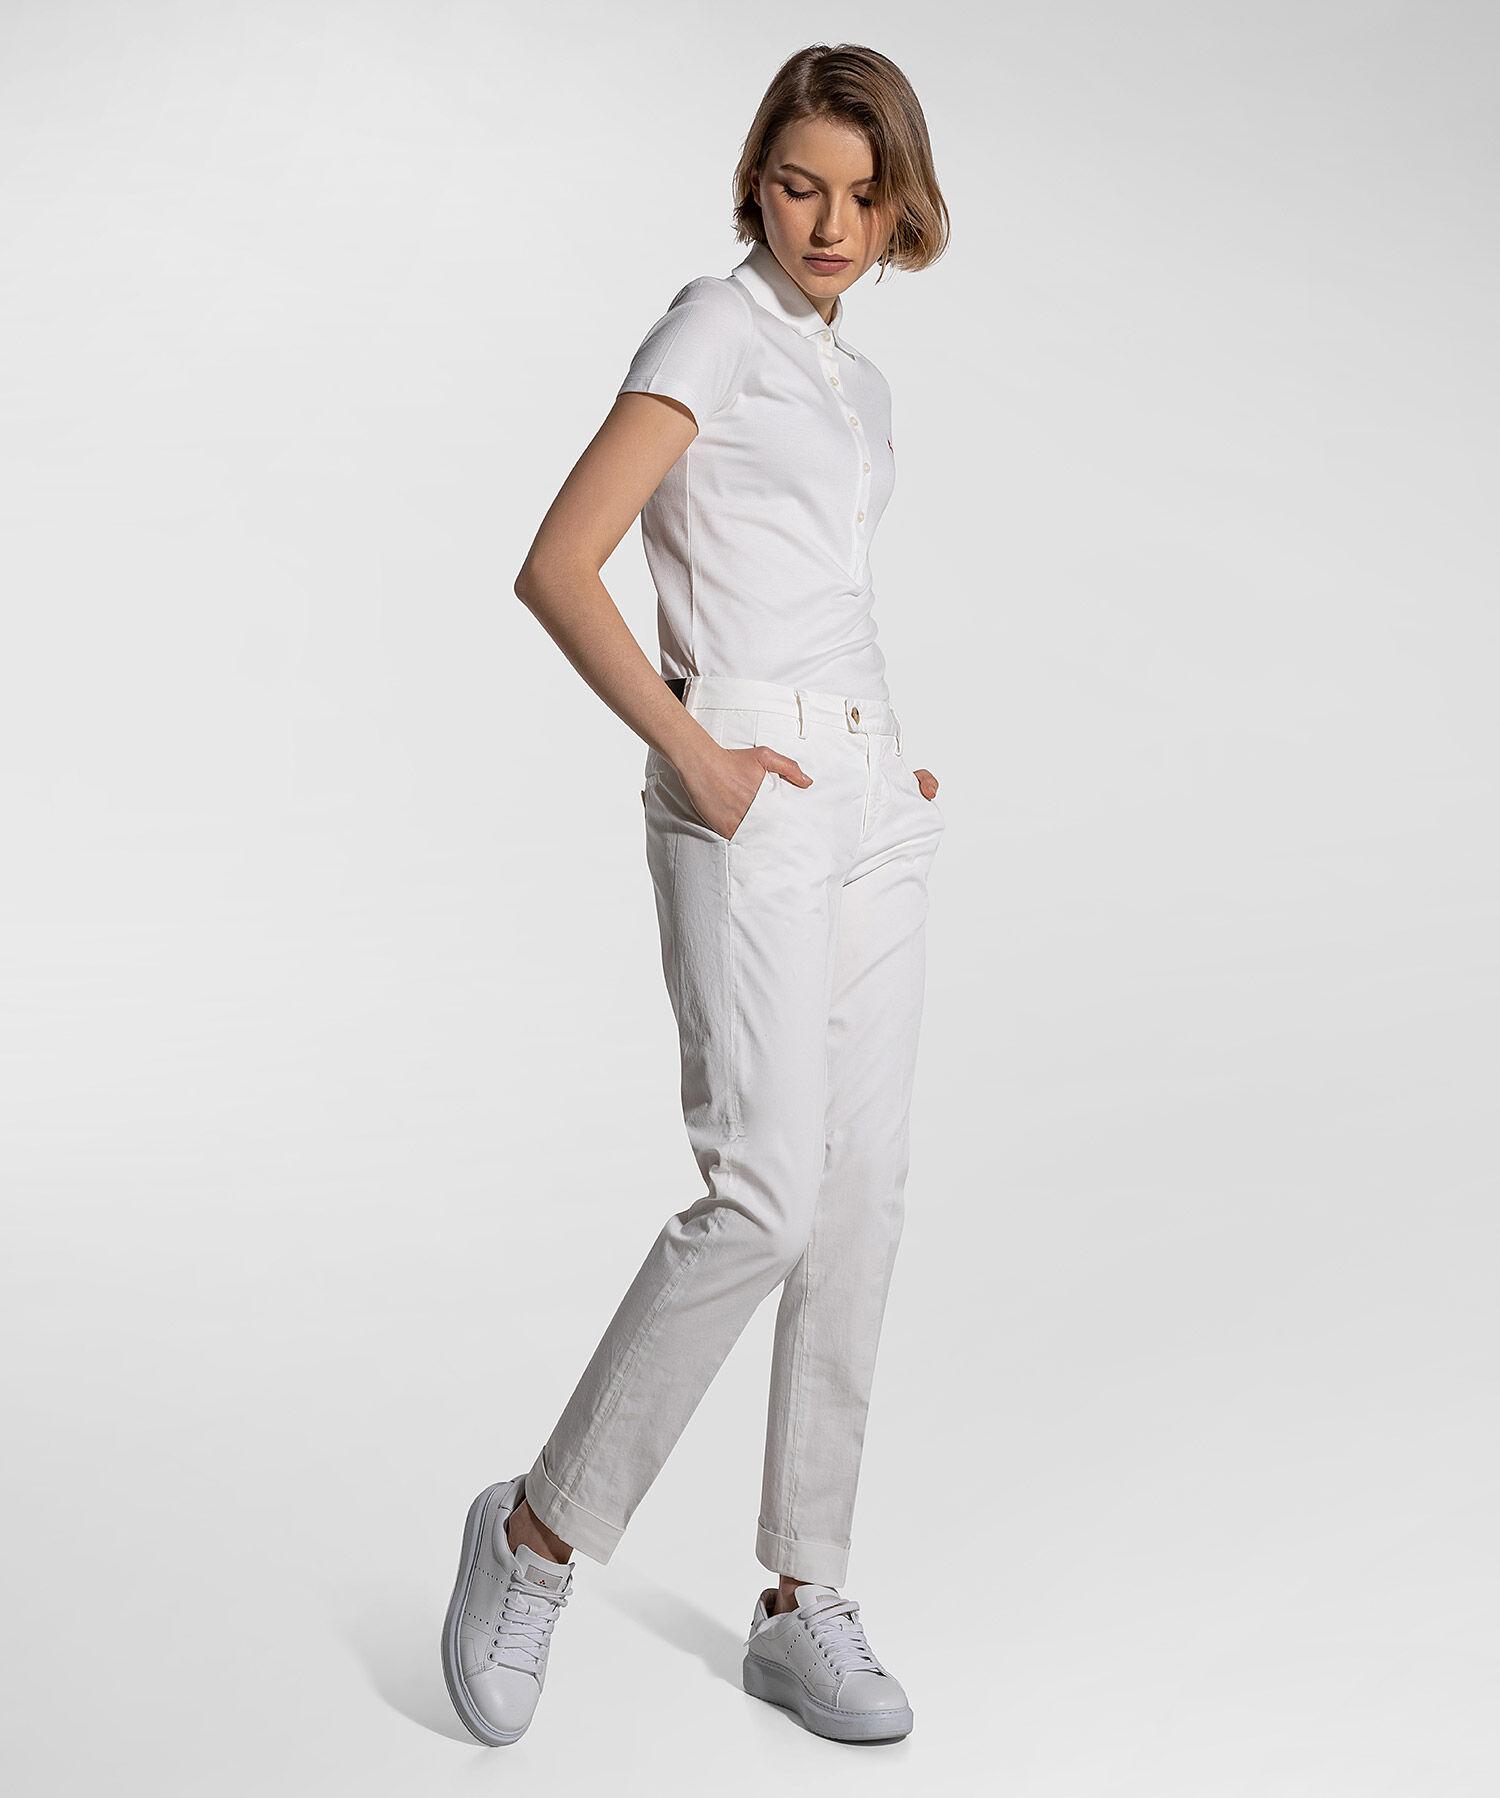 Pantaloni In Gabardine Di Cotone Stretch - Peuterey